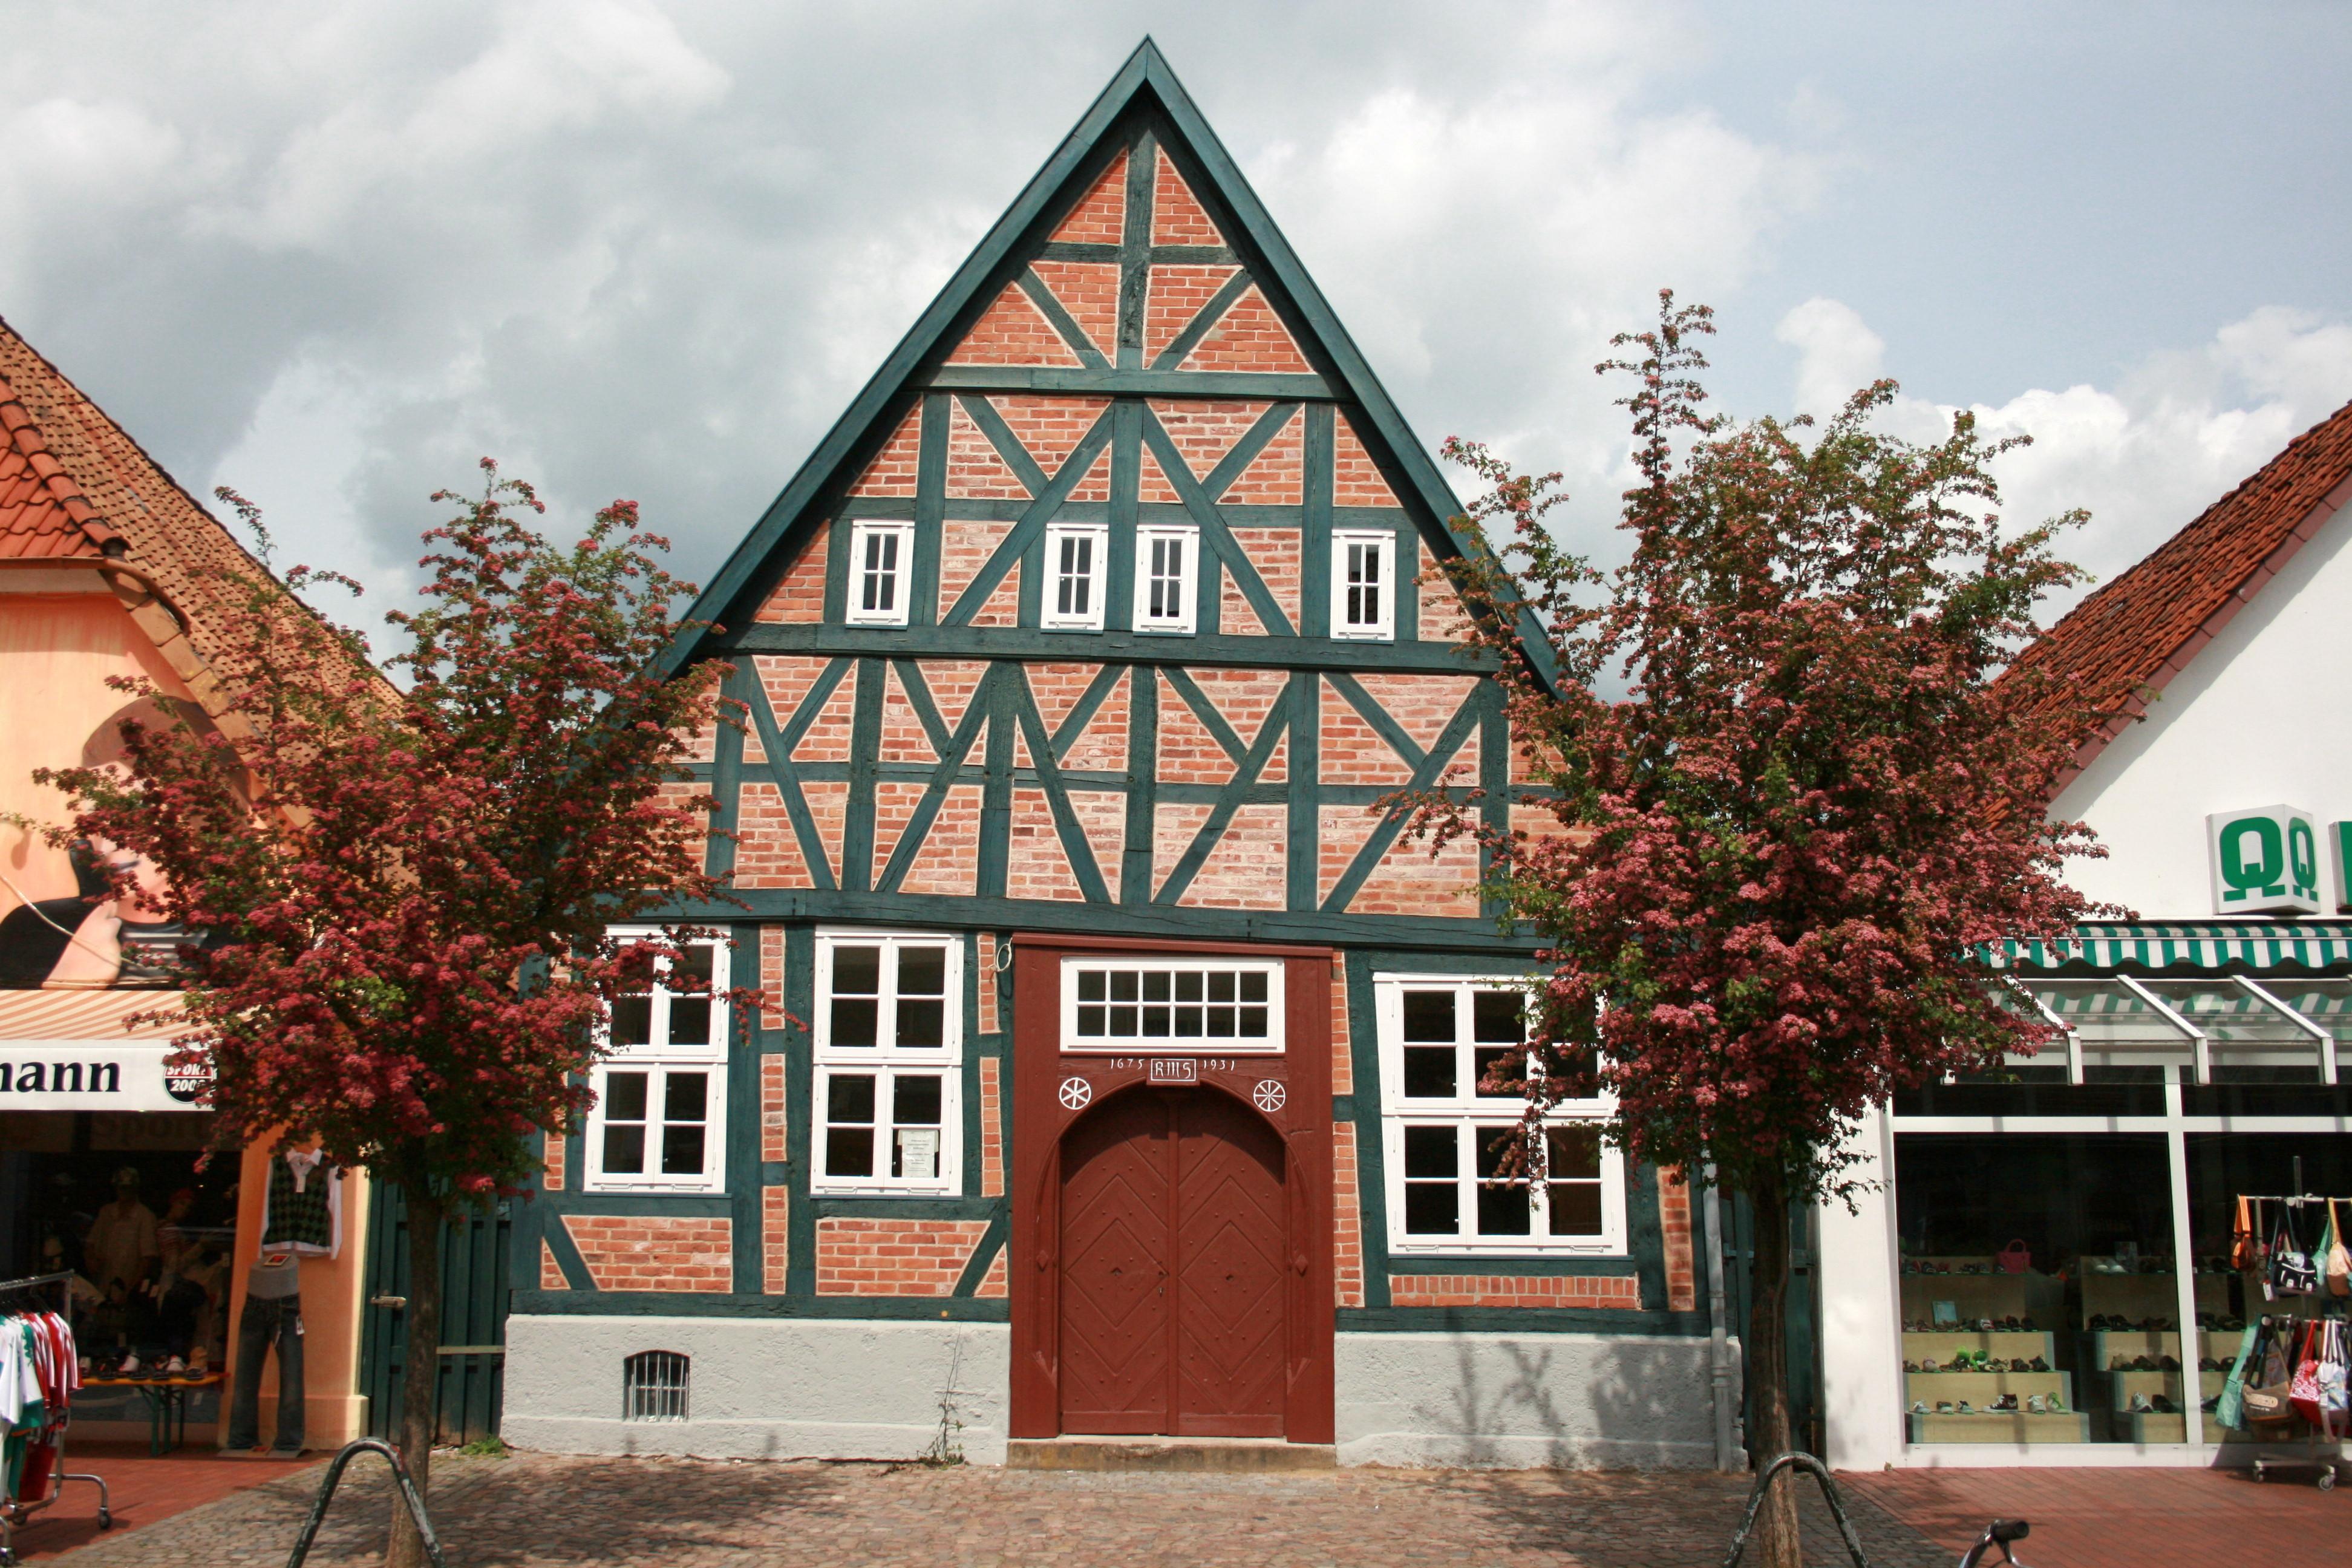 katsumi Rotenburg an der Wümme(Lower Saxony)